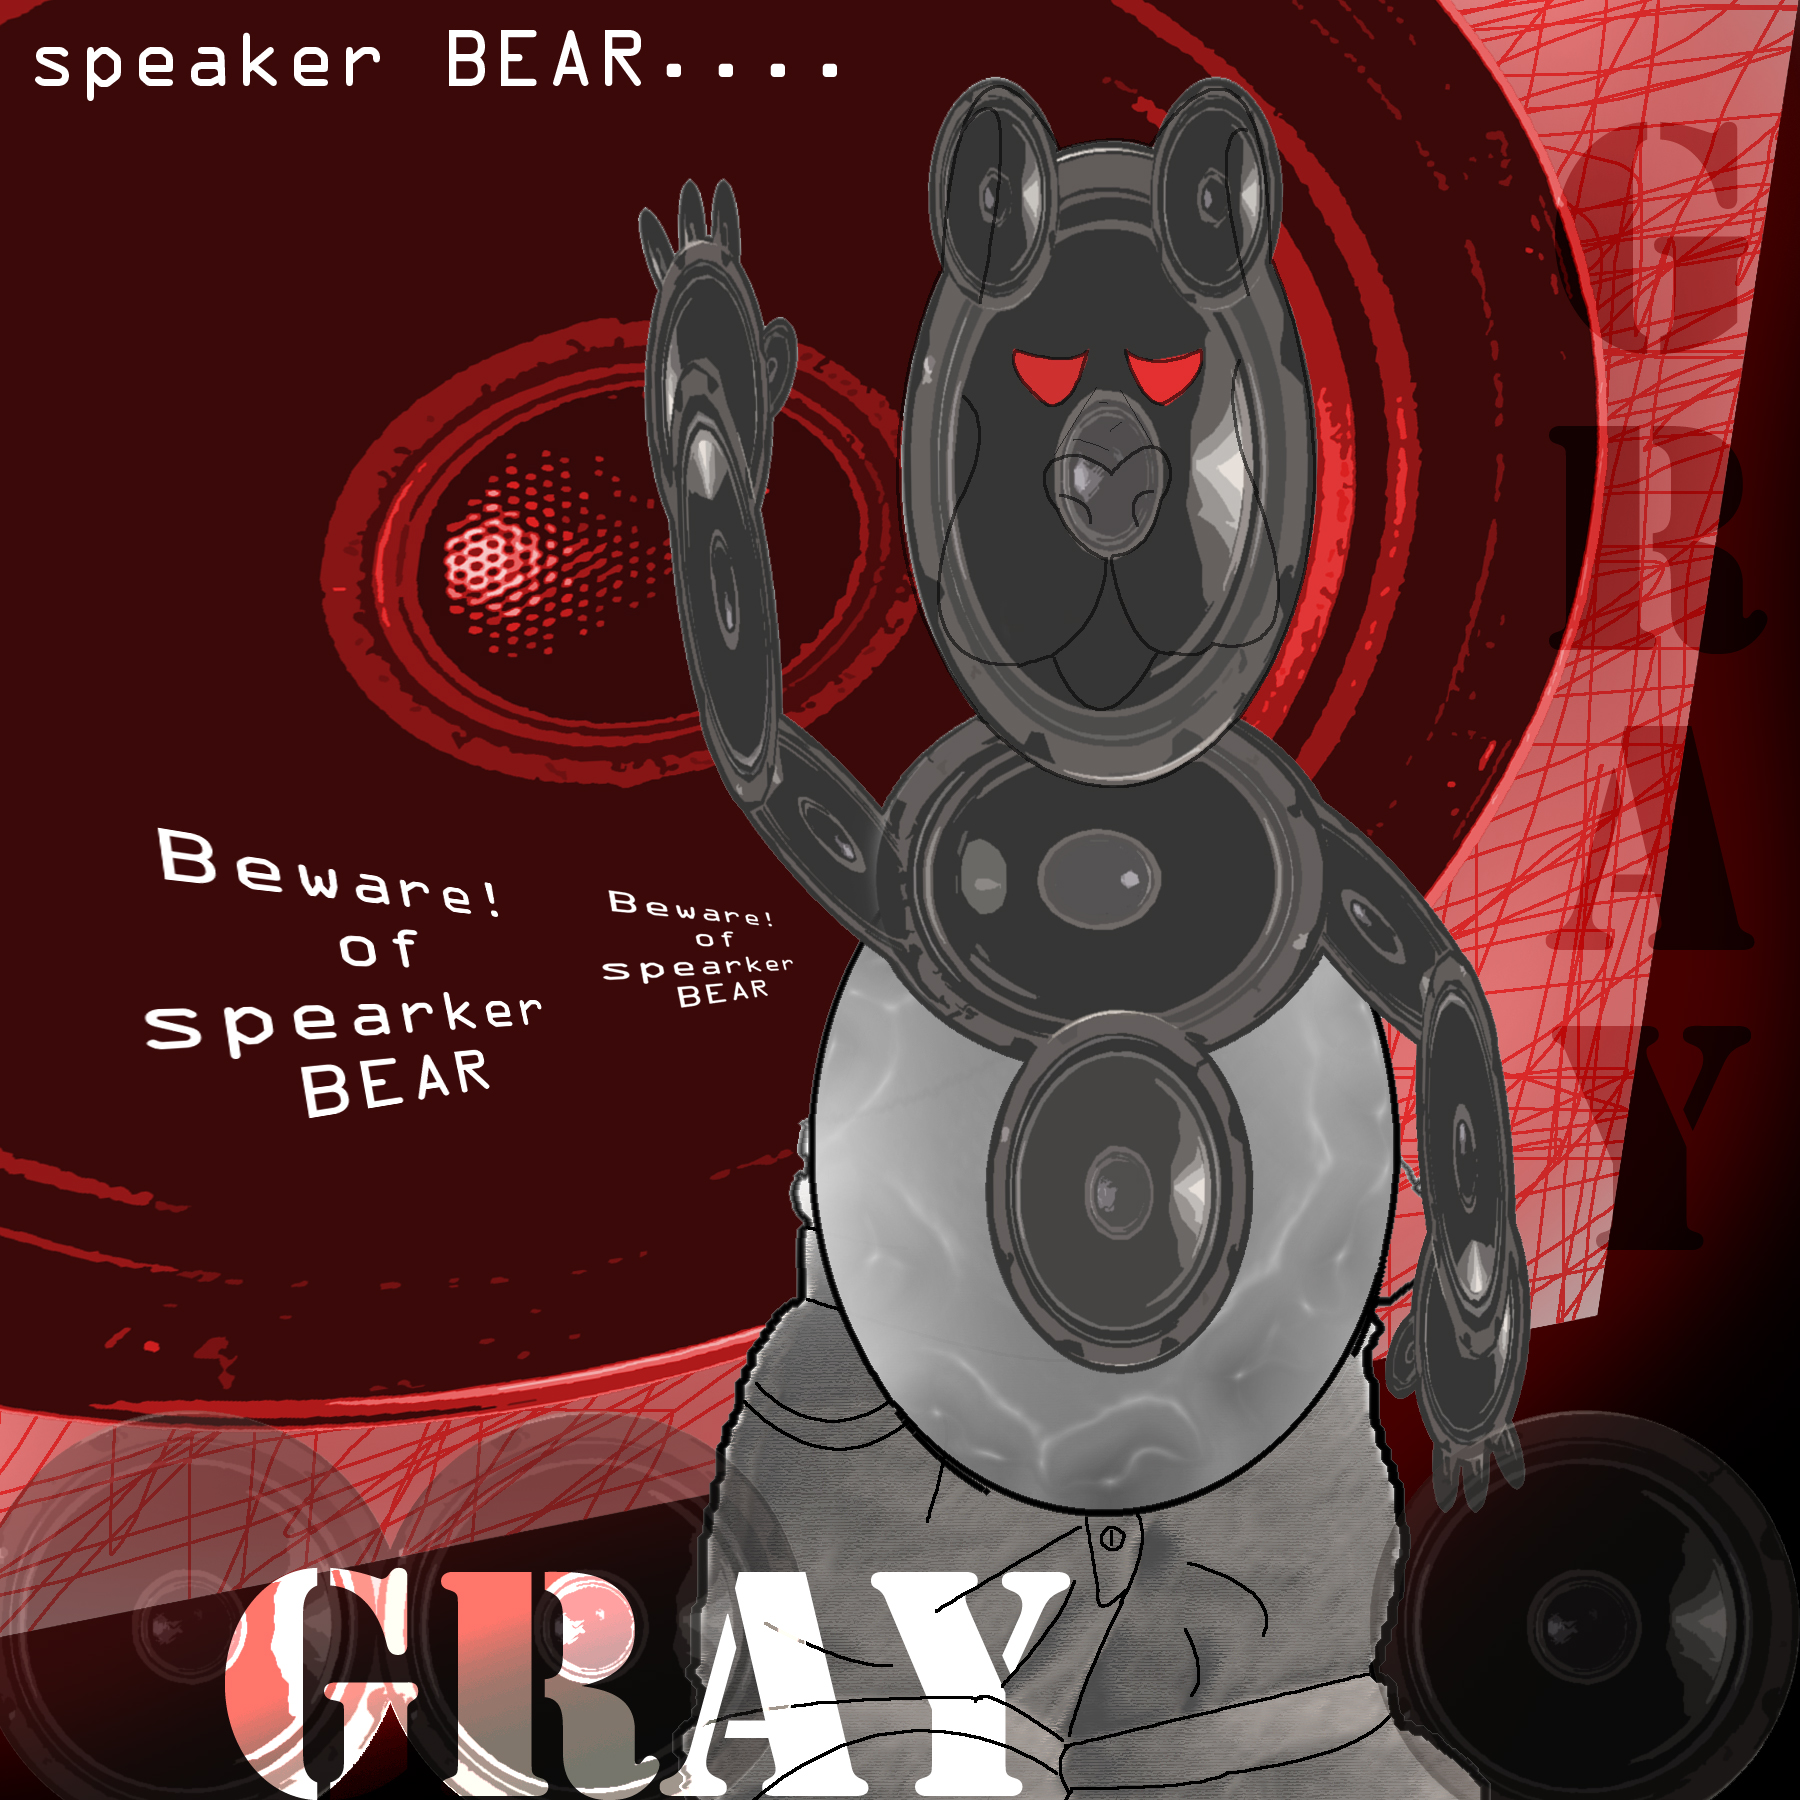 spearker Bear